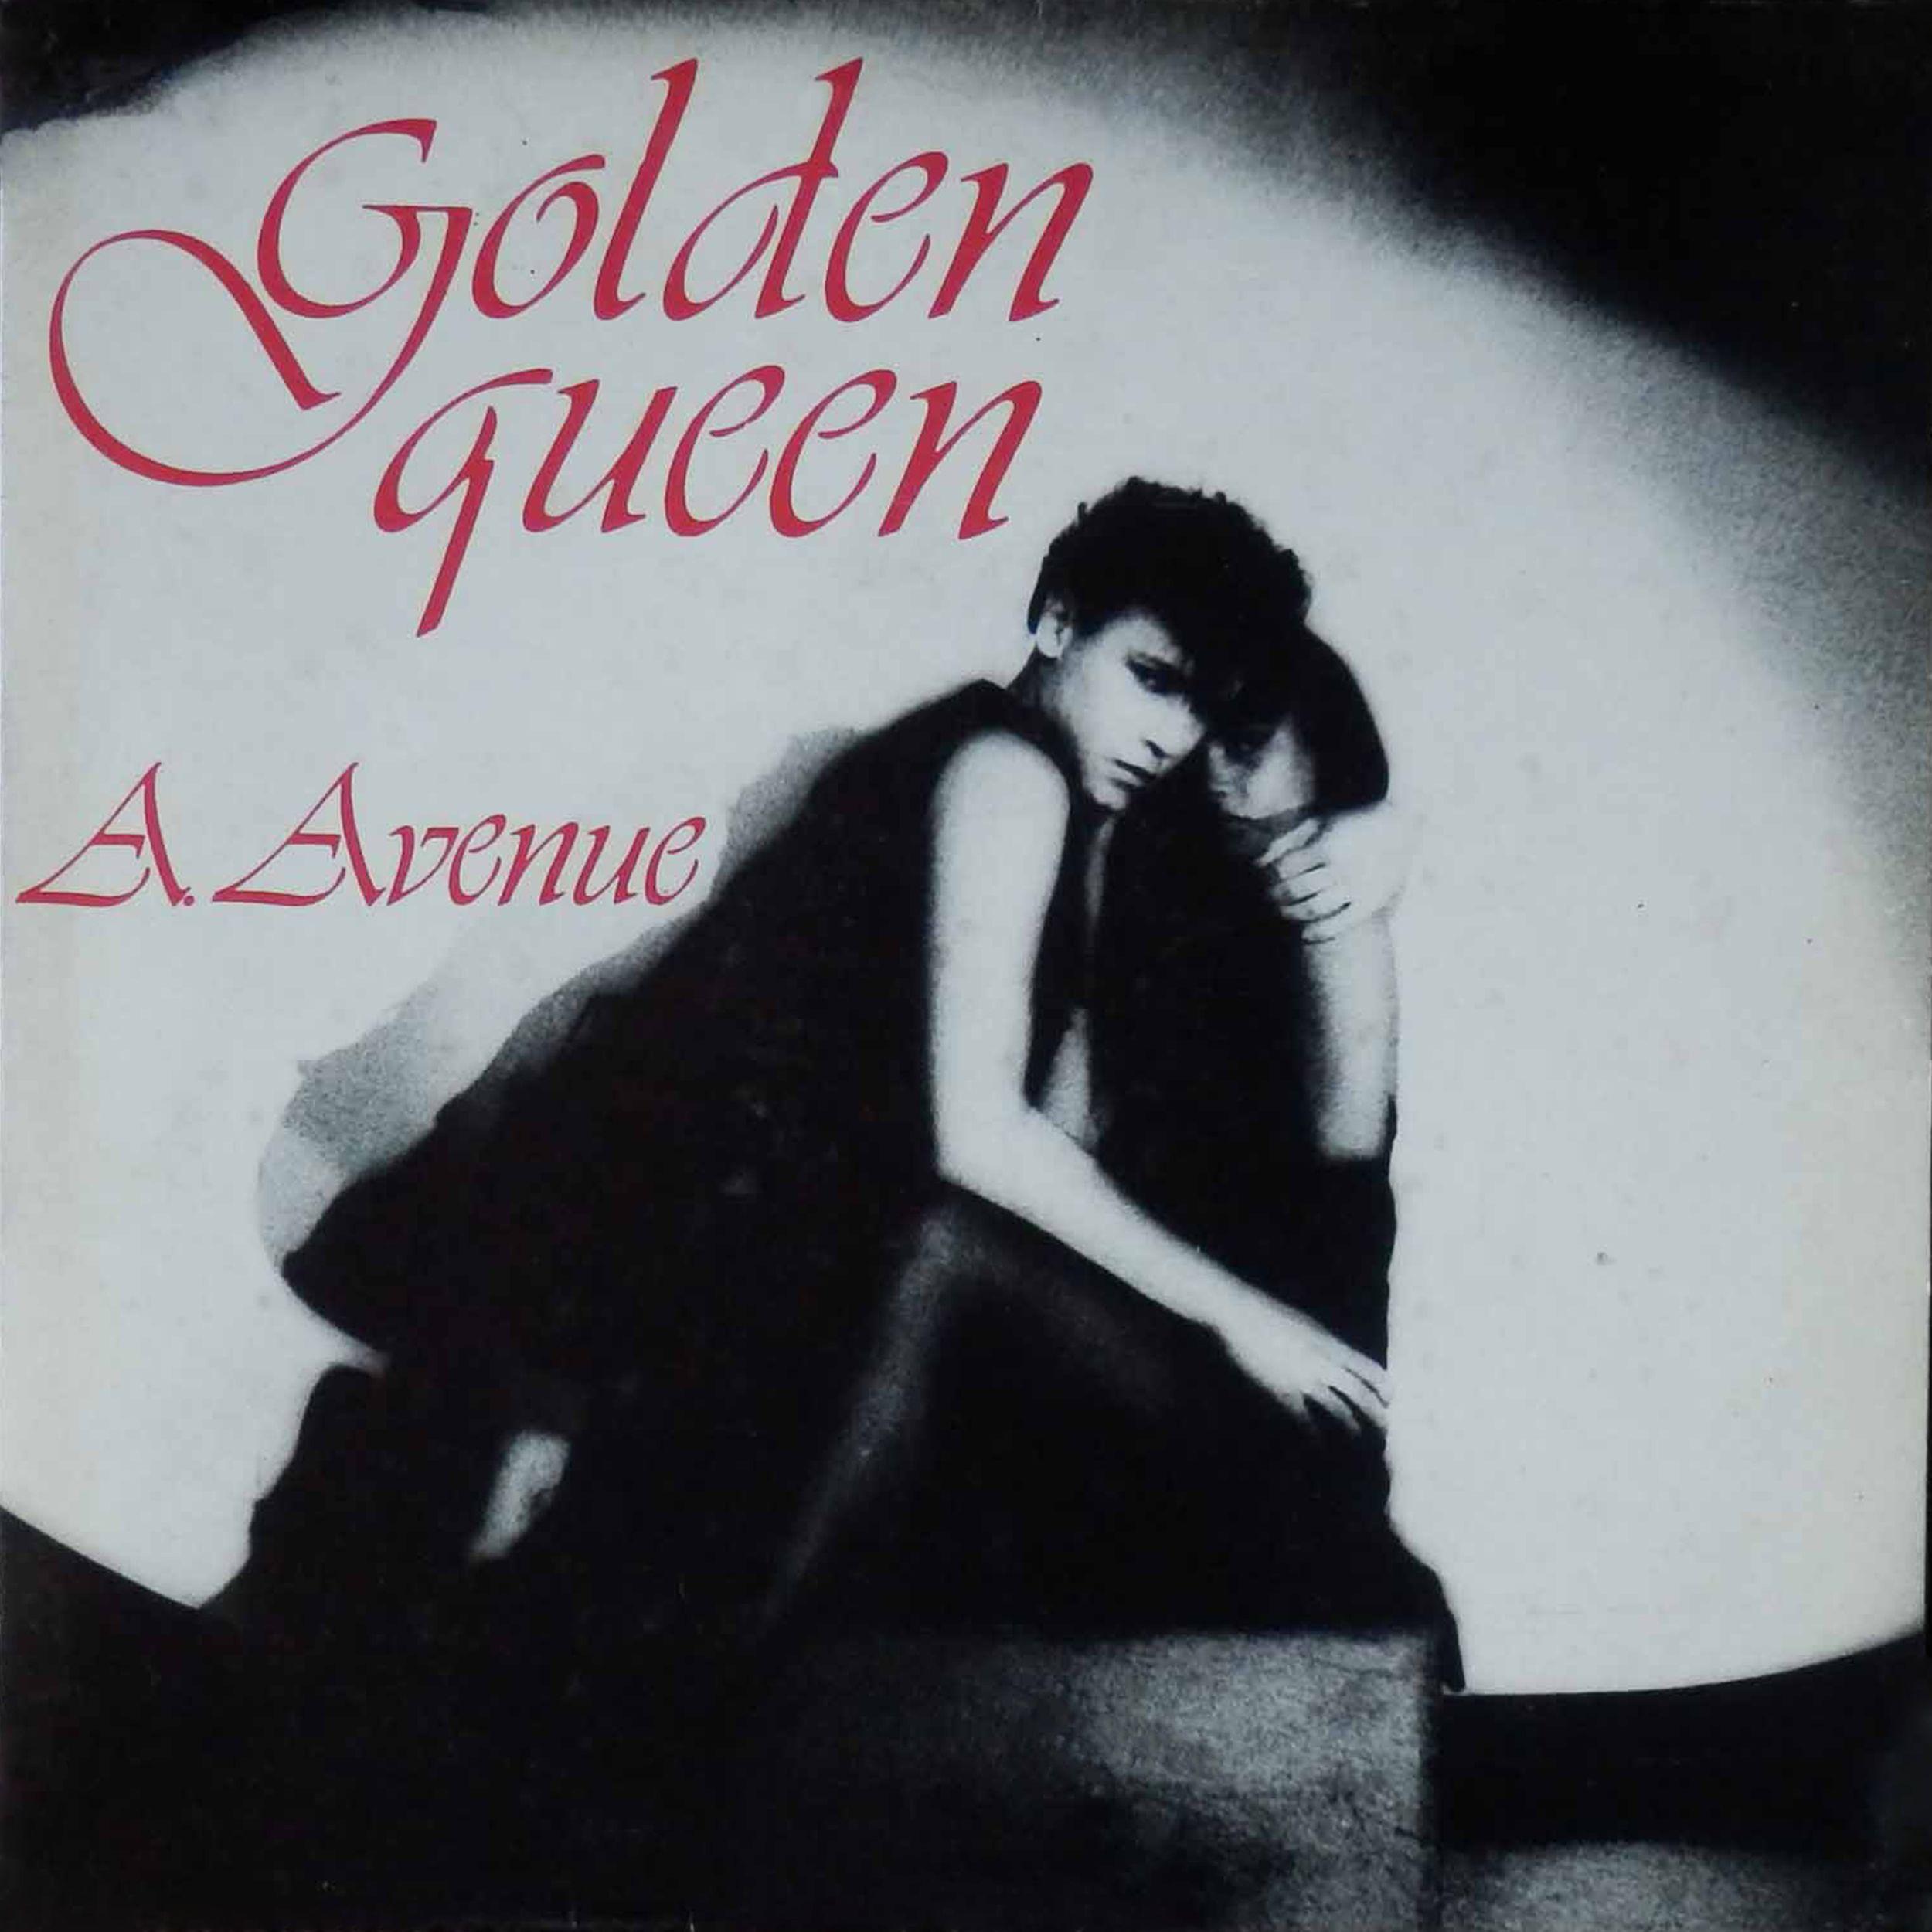 opcm_12_080_a._avenue_-_golden_queen.jpg